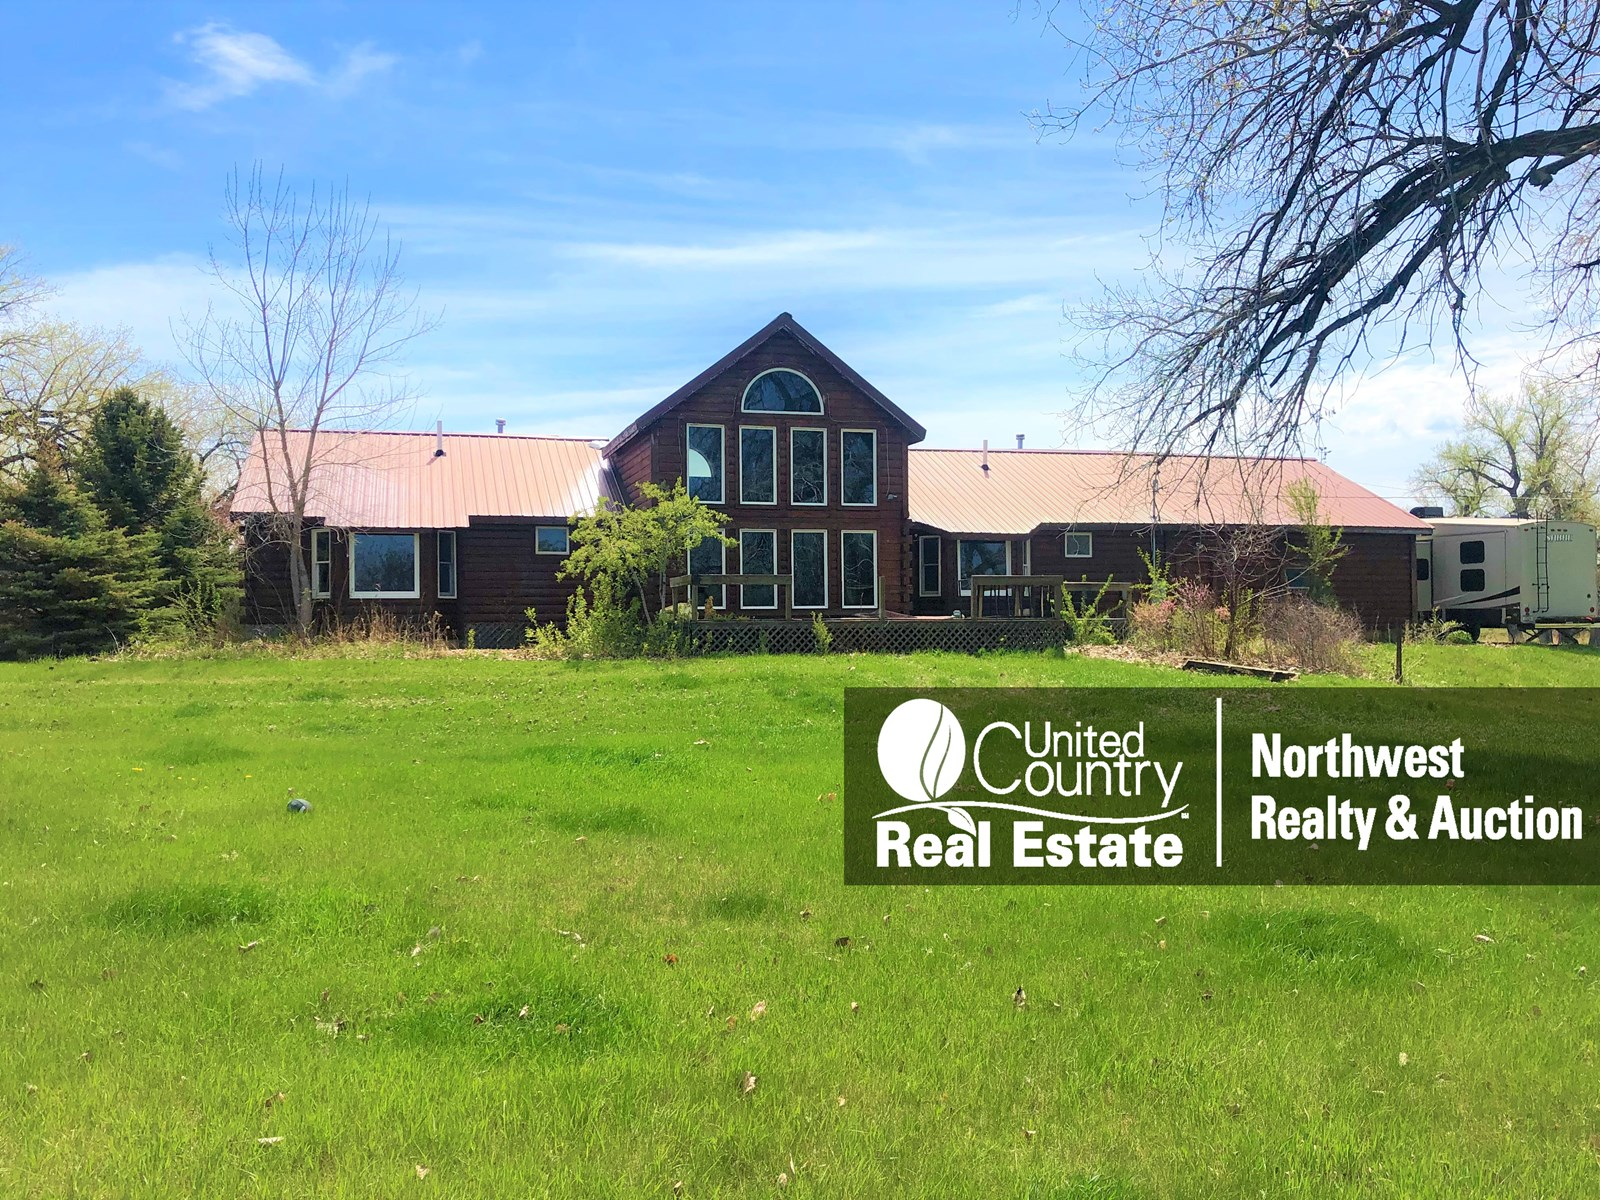 MT Log Home For Sale, Irrigated Farm Land, Grazing, Shop